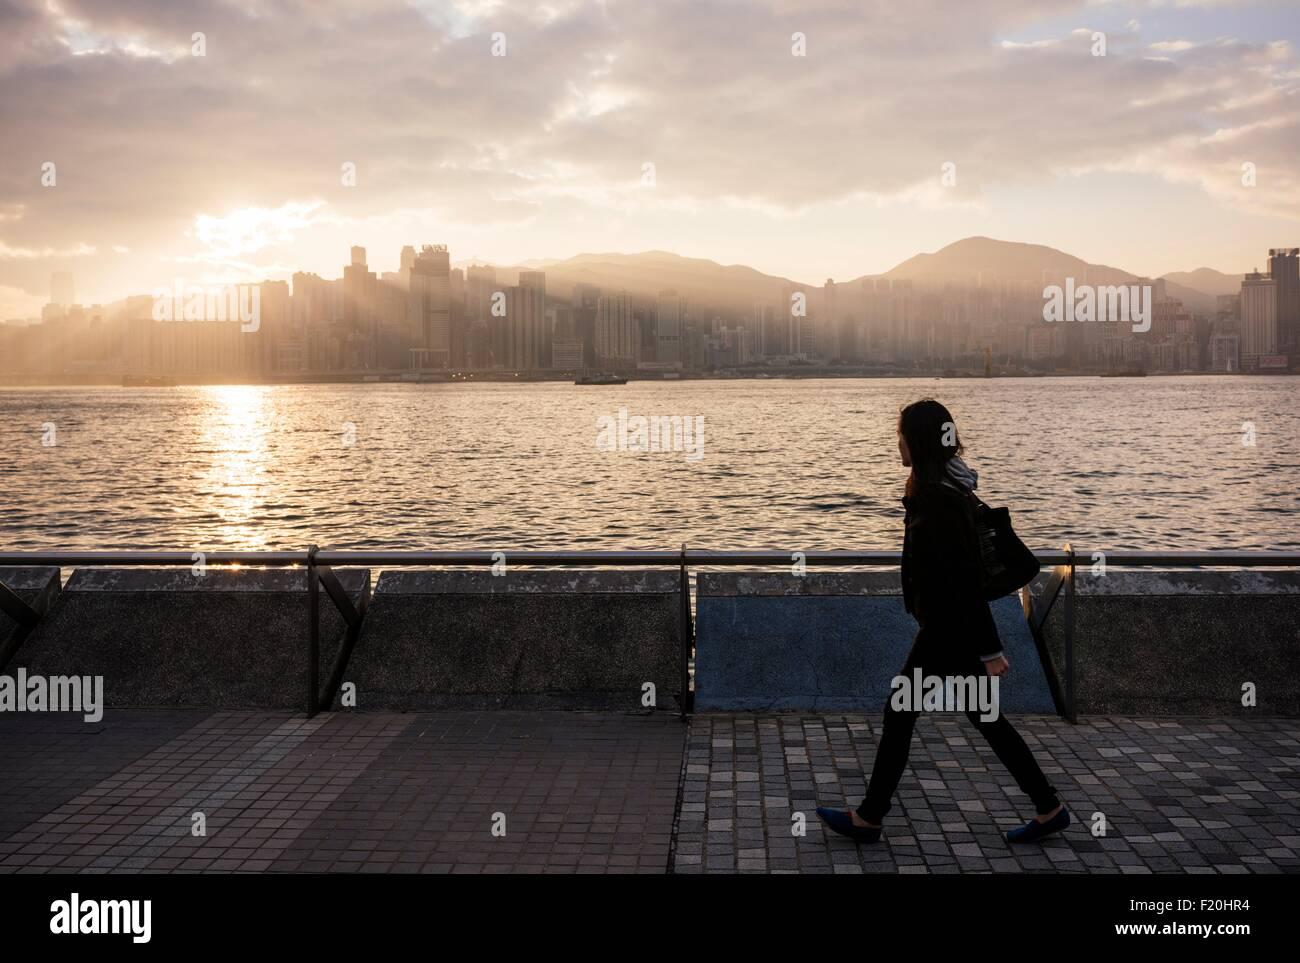 Vista lateral del joven caminando por el agua, Hong Kong, China Imagen De Stock